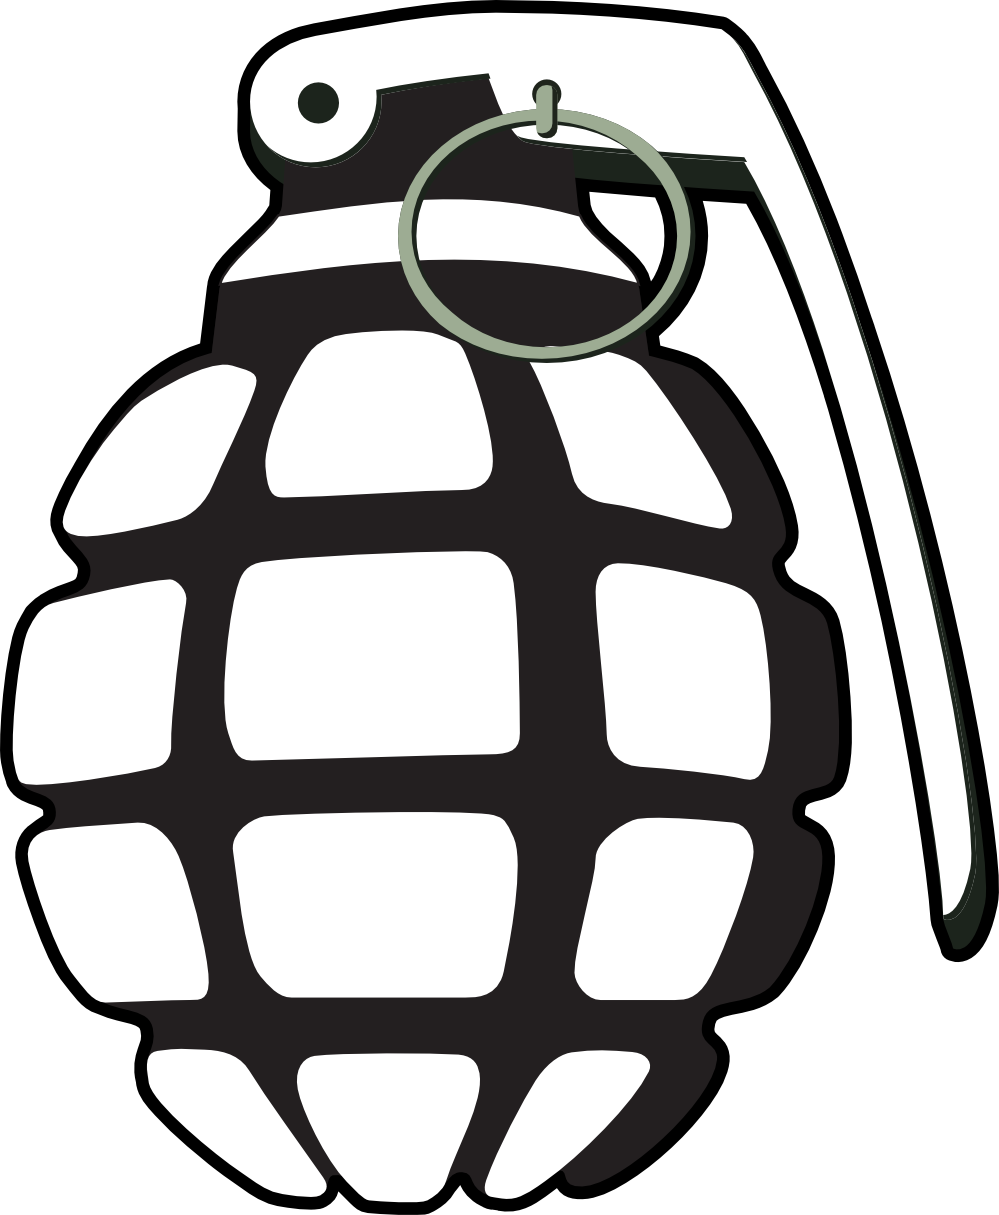 Drawn grenade #5